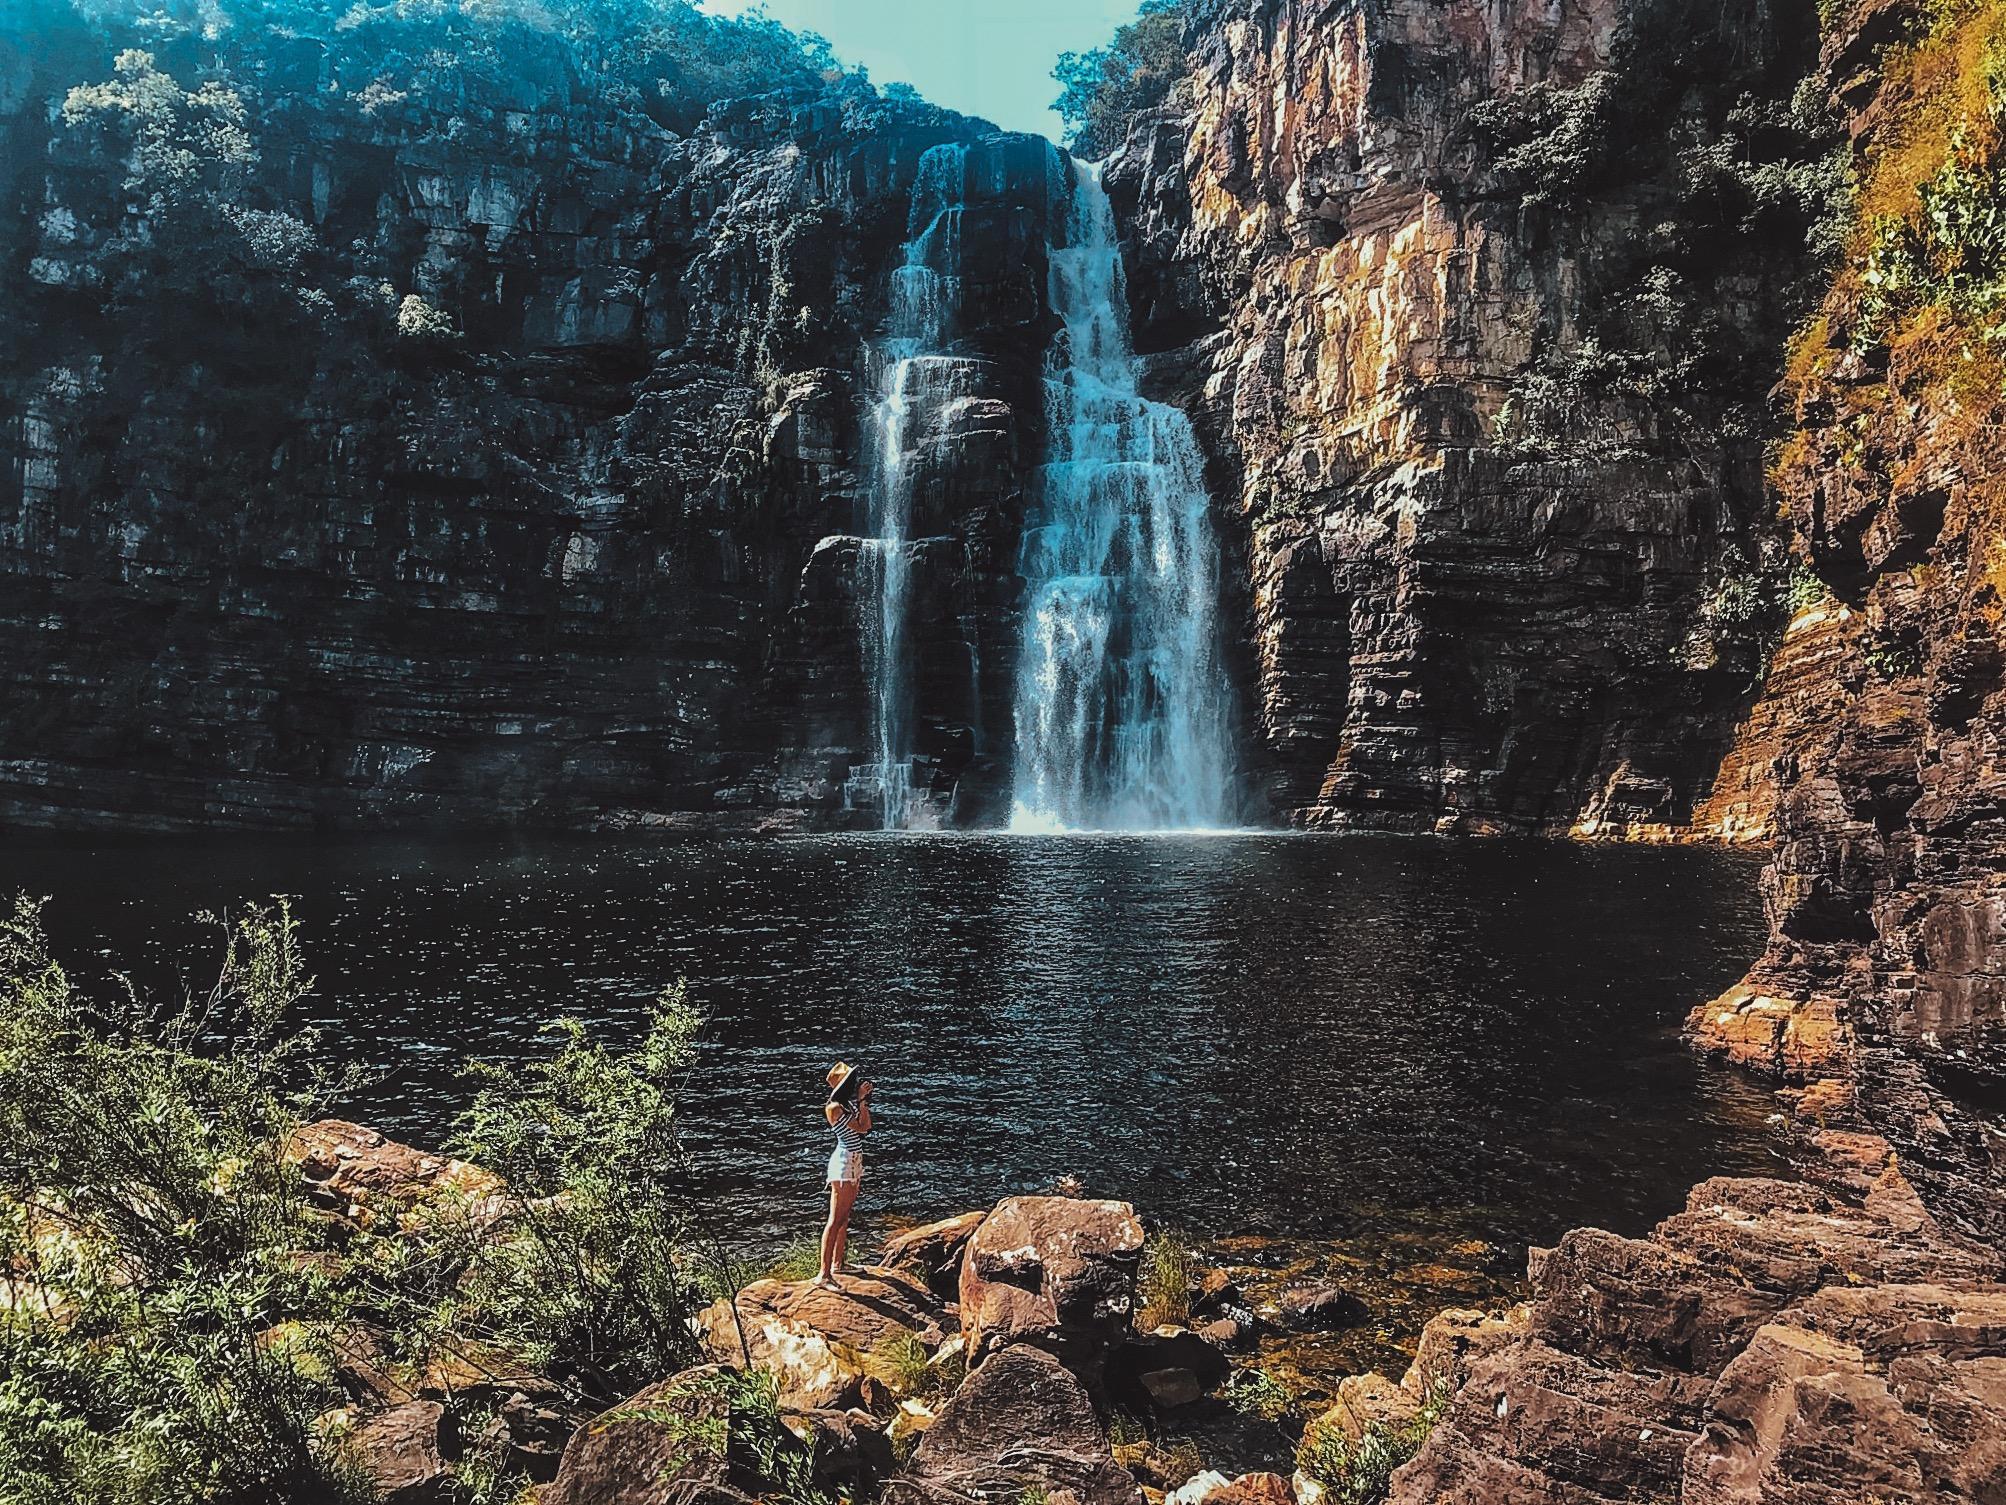 lifesthayle-parque-nacional-da-chapada-dos-veadeiros-salto-80m.JPG